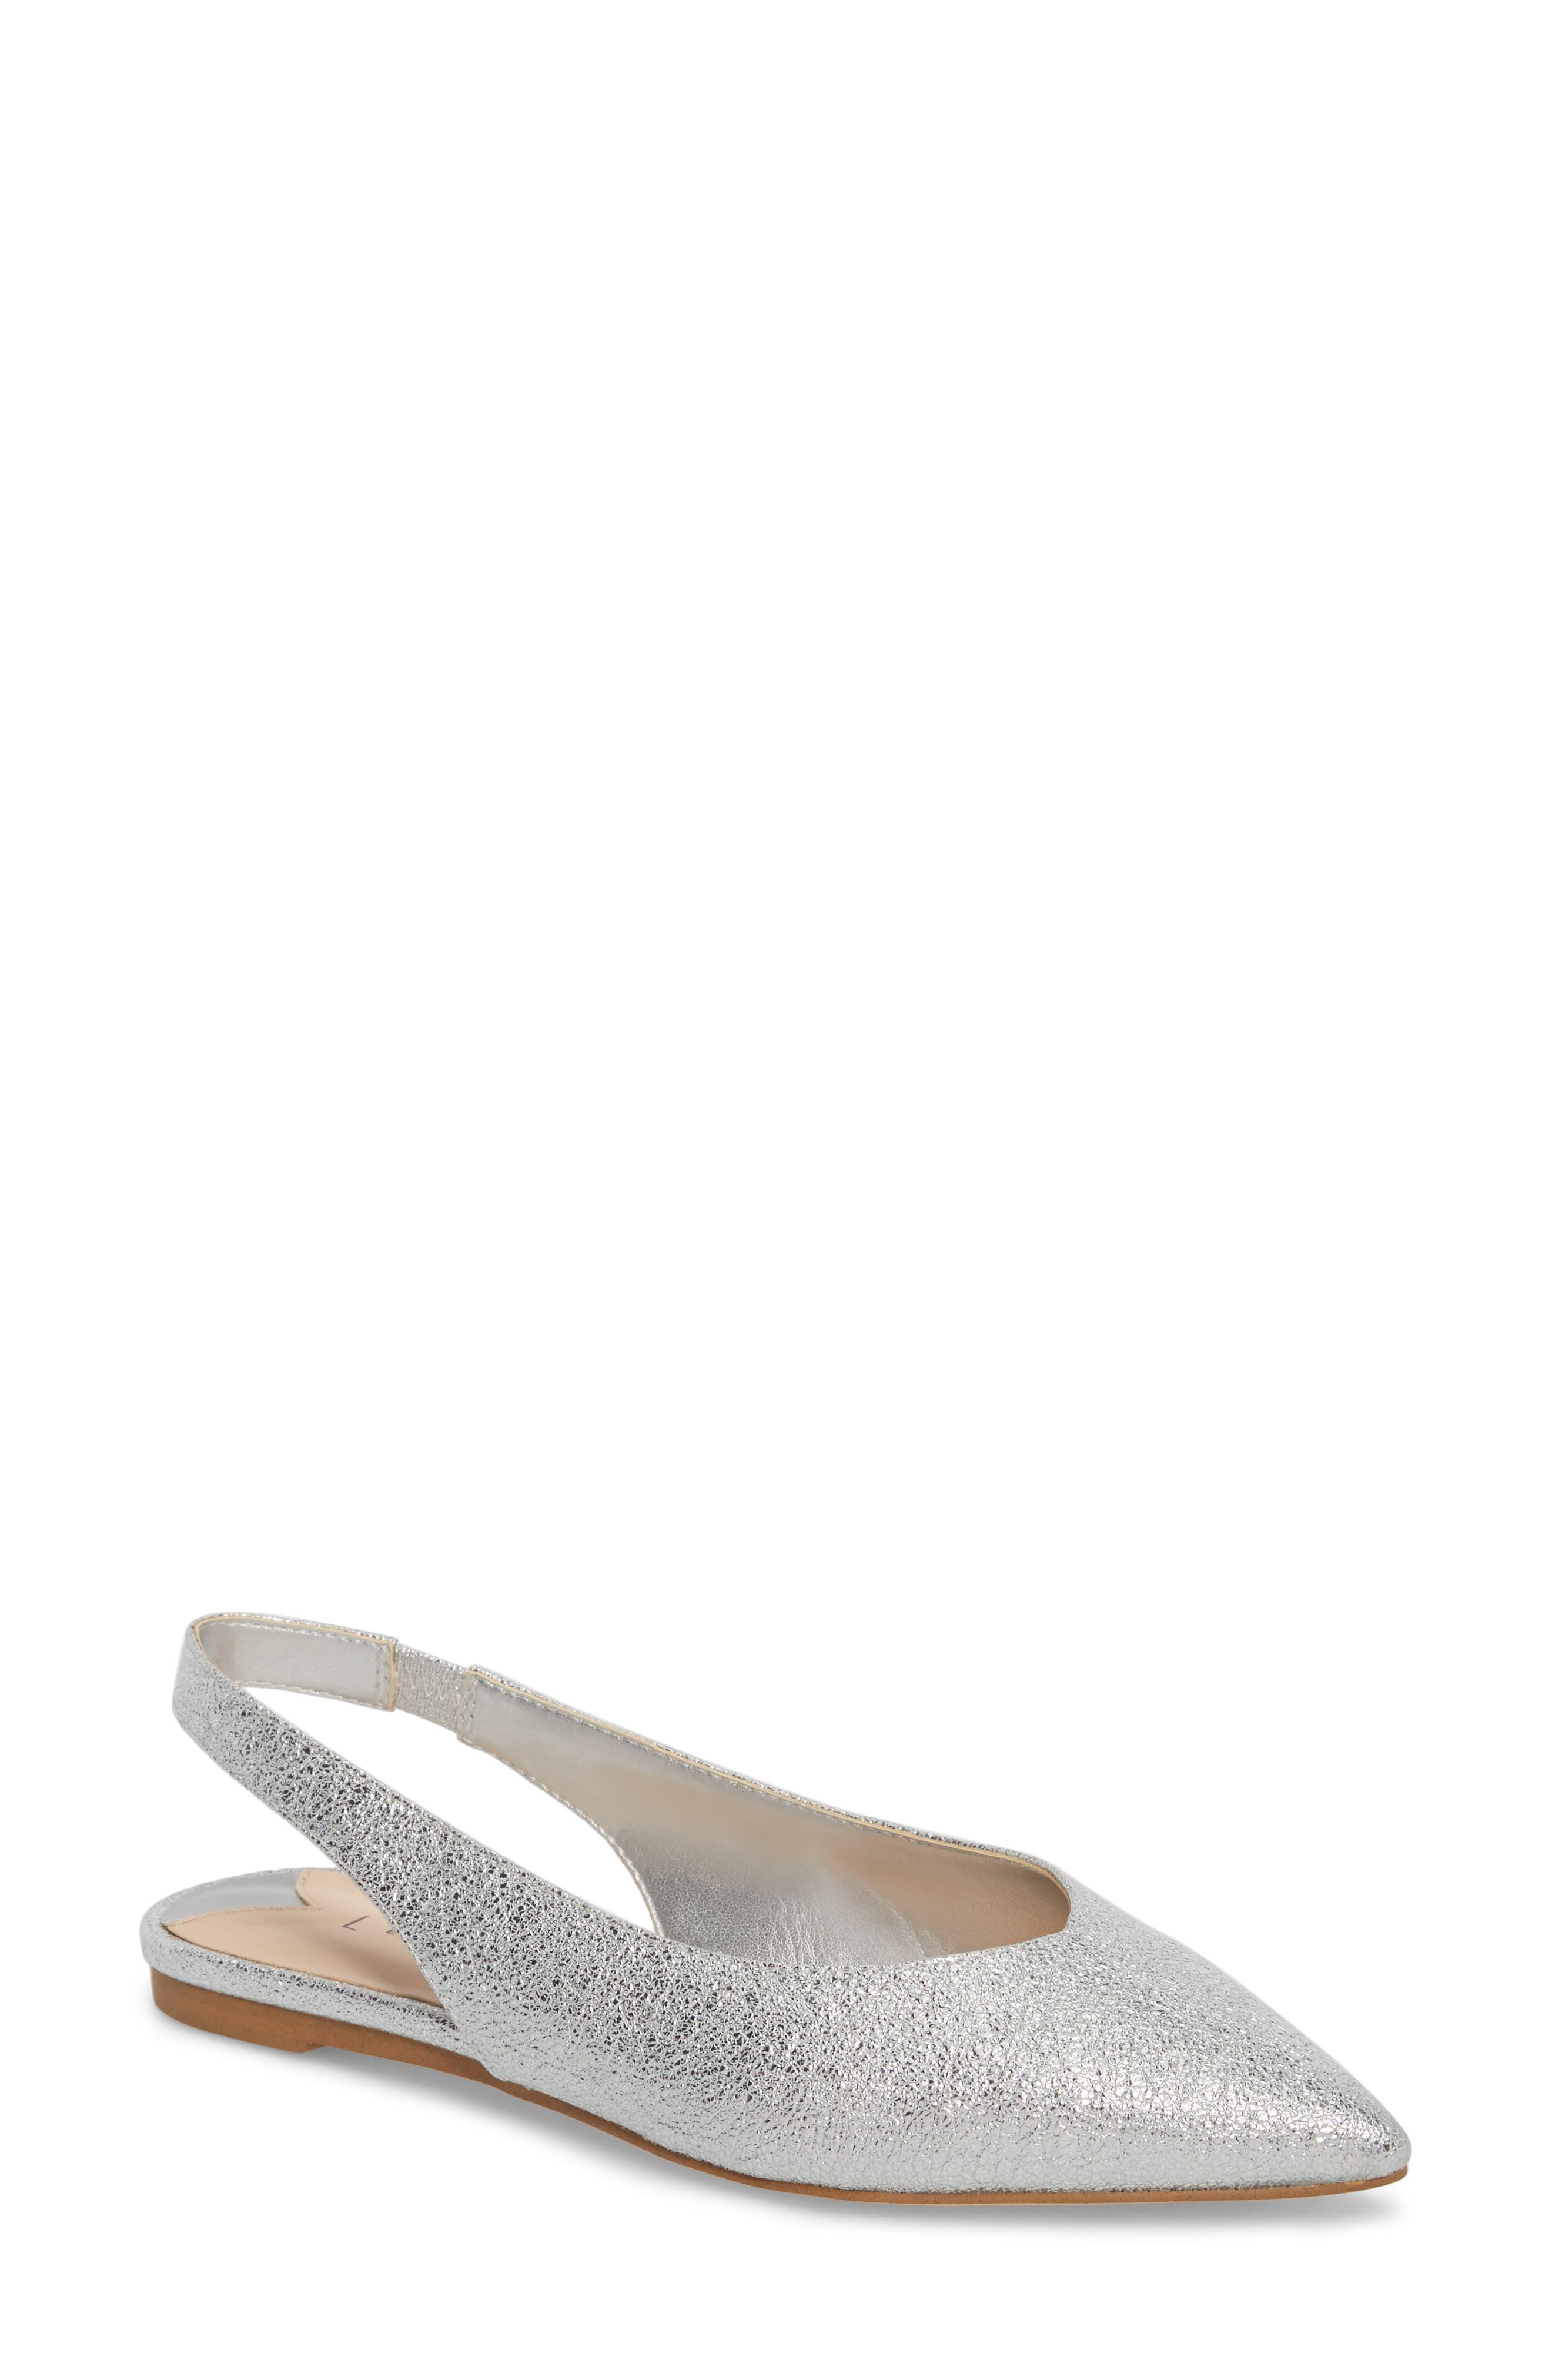 Masonn Slingback Flat,                             Main thumbnail 1, color,                             Silver Crackle Faux Leather